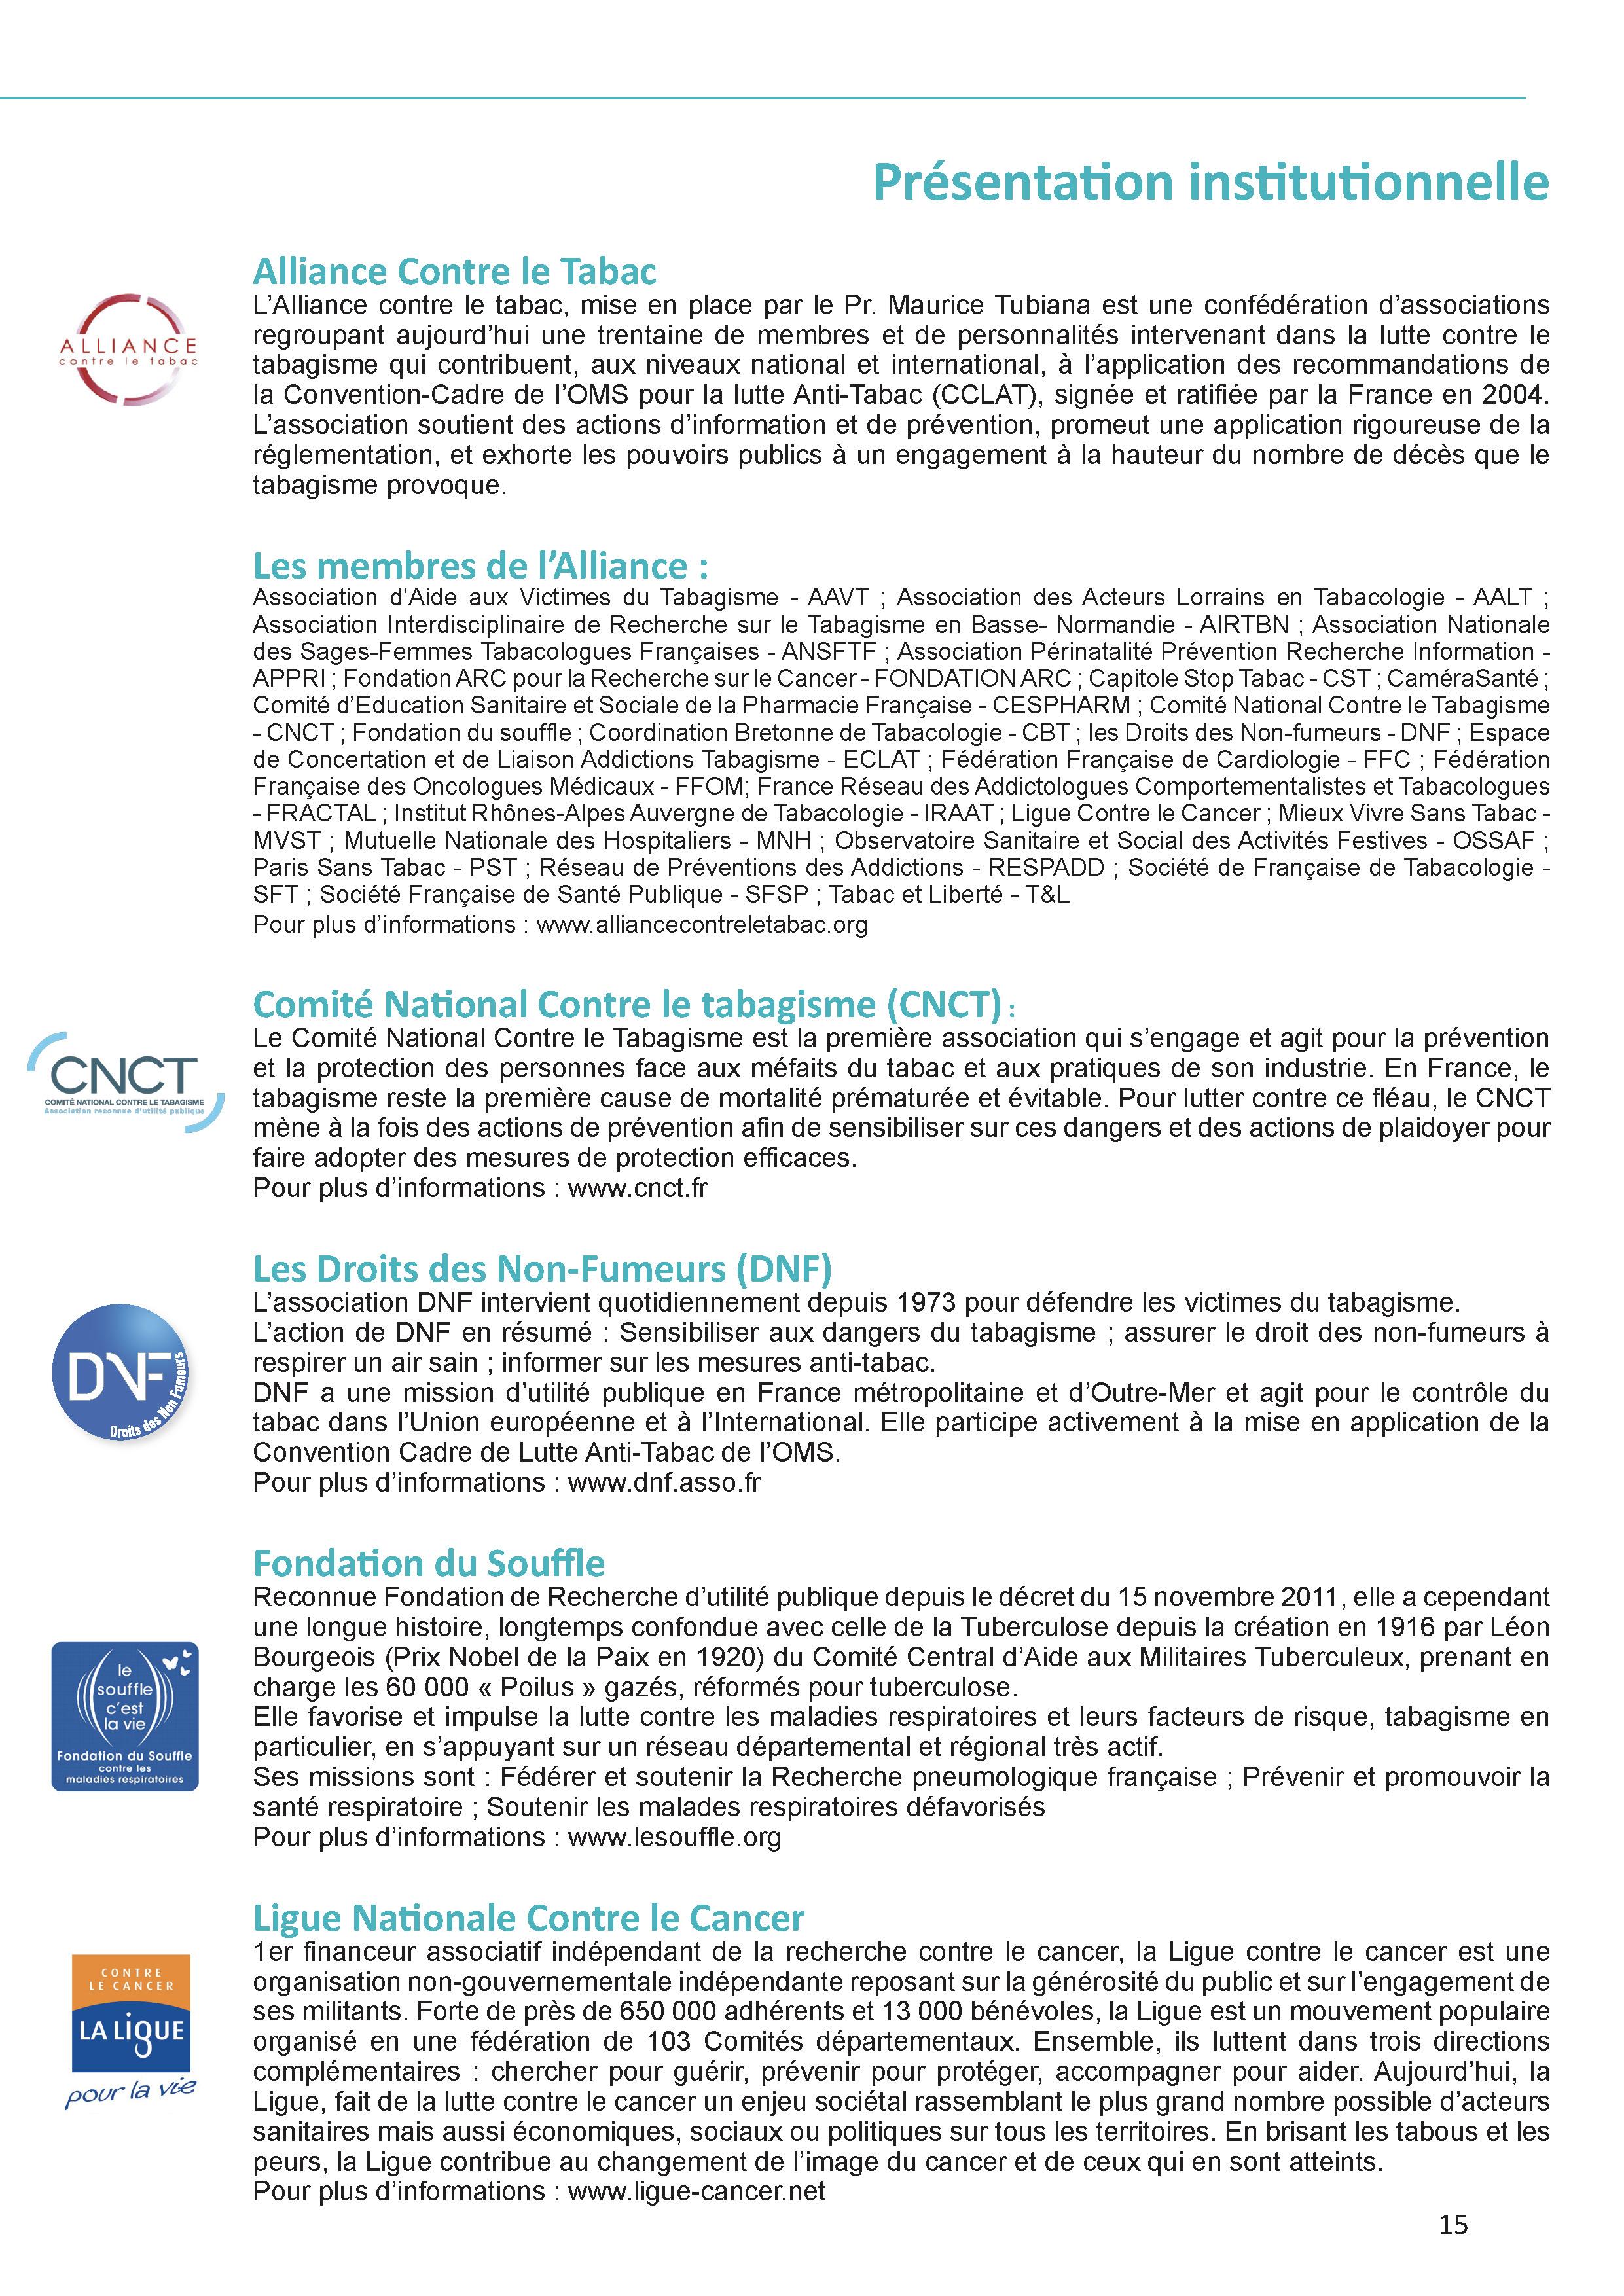 Alliance-DP_commerce-illicite-26mai2015_Page_15.jpg